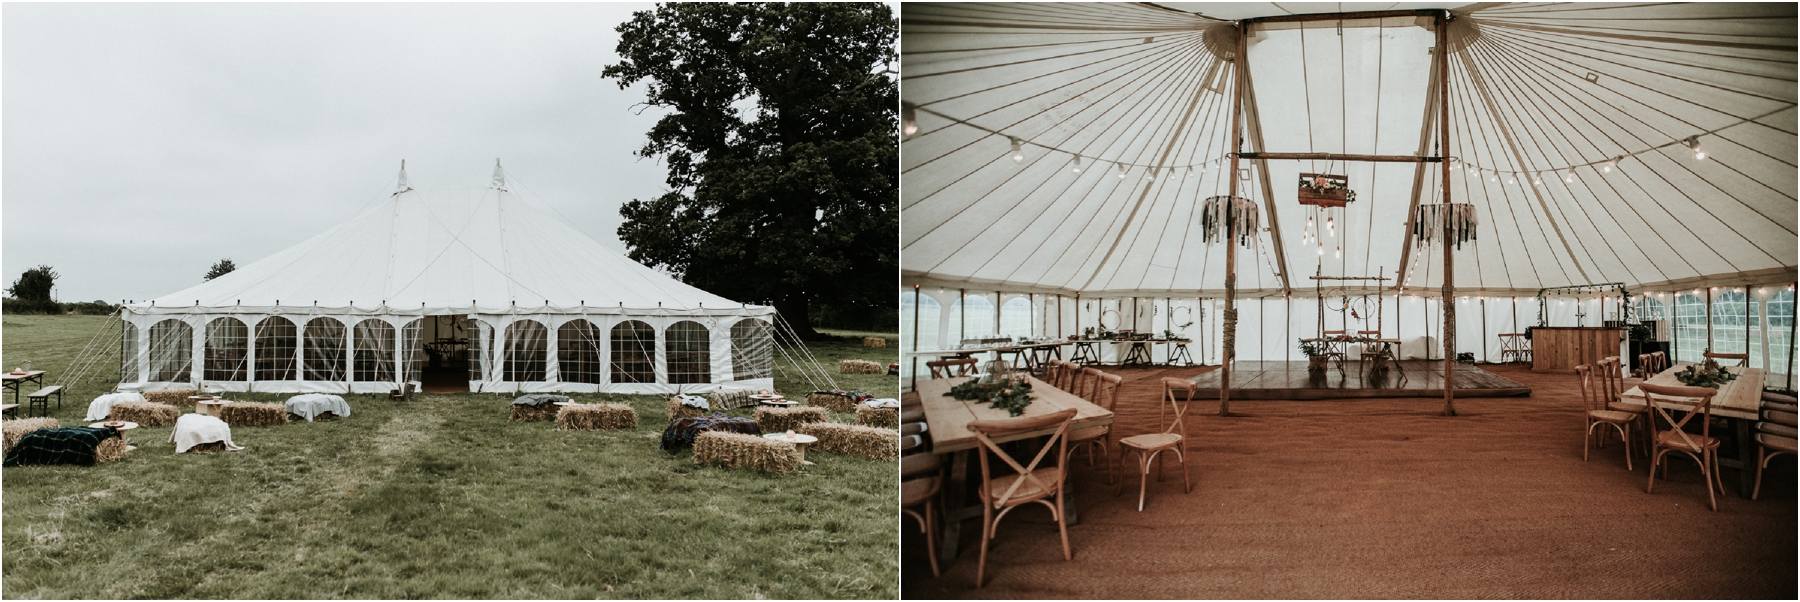 Herefordshire-uk-wedding-photographer_0052.jpg